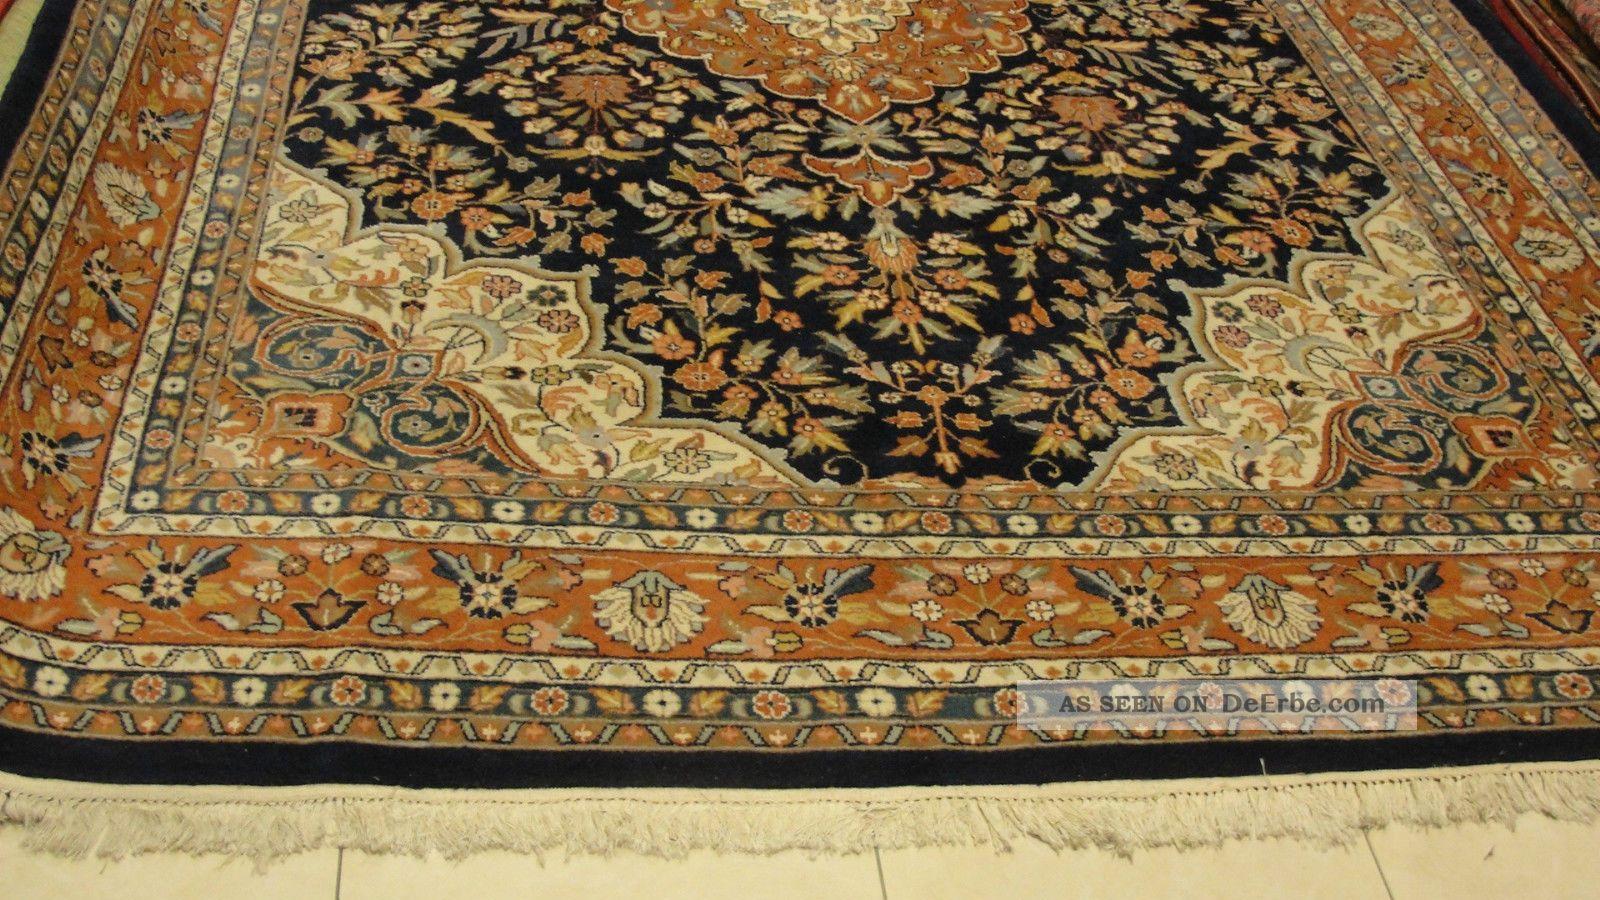 wunderschoner orient perser teppich 350x250 cm tapis carpet tappeto tapijt 0650. Black Bedroom Furniture Sets. Home Design Ideas